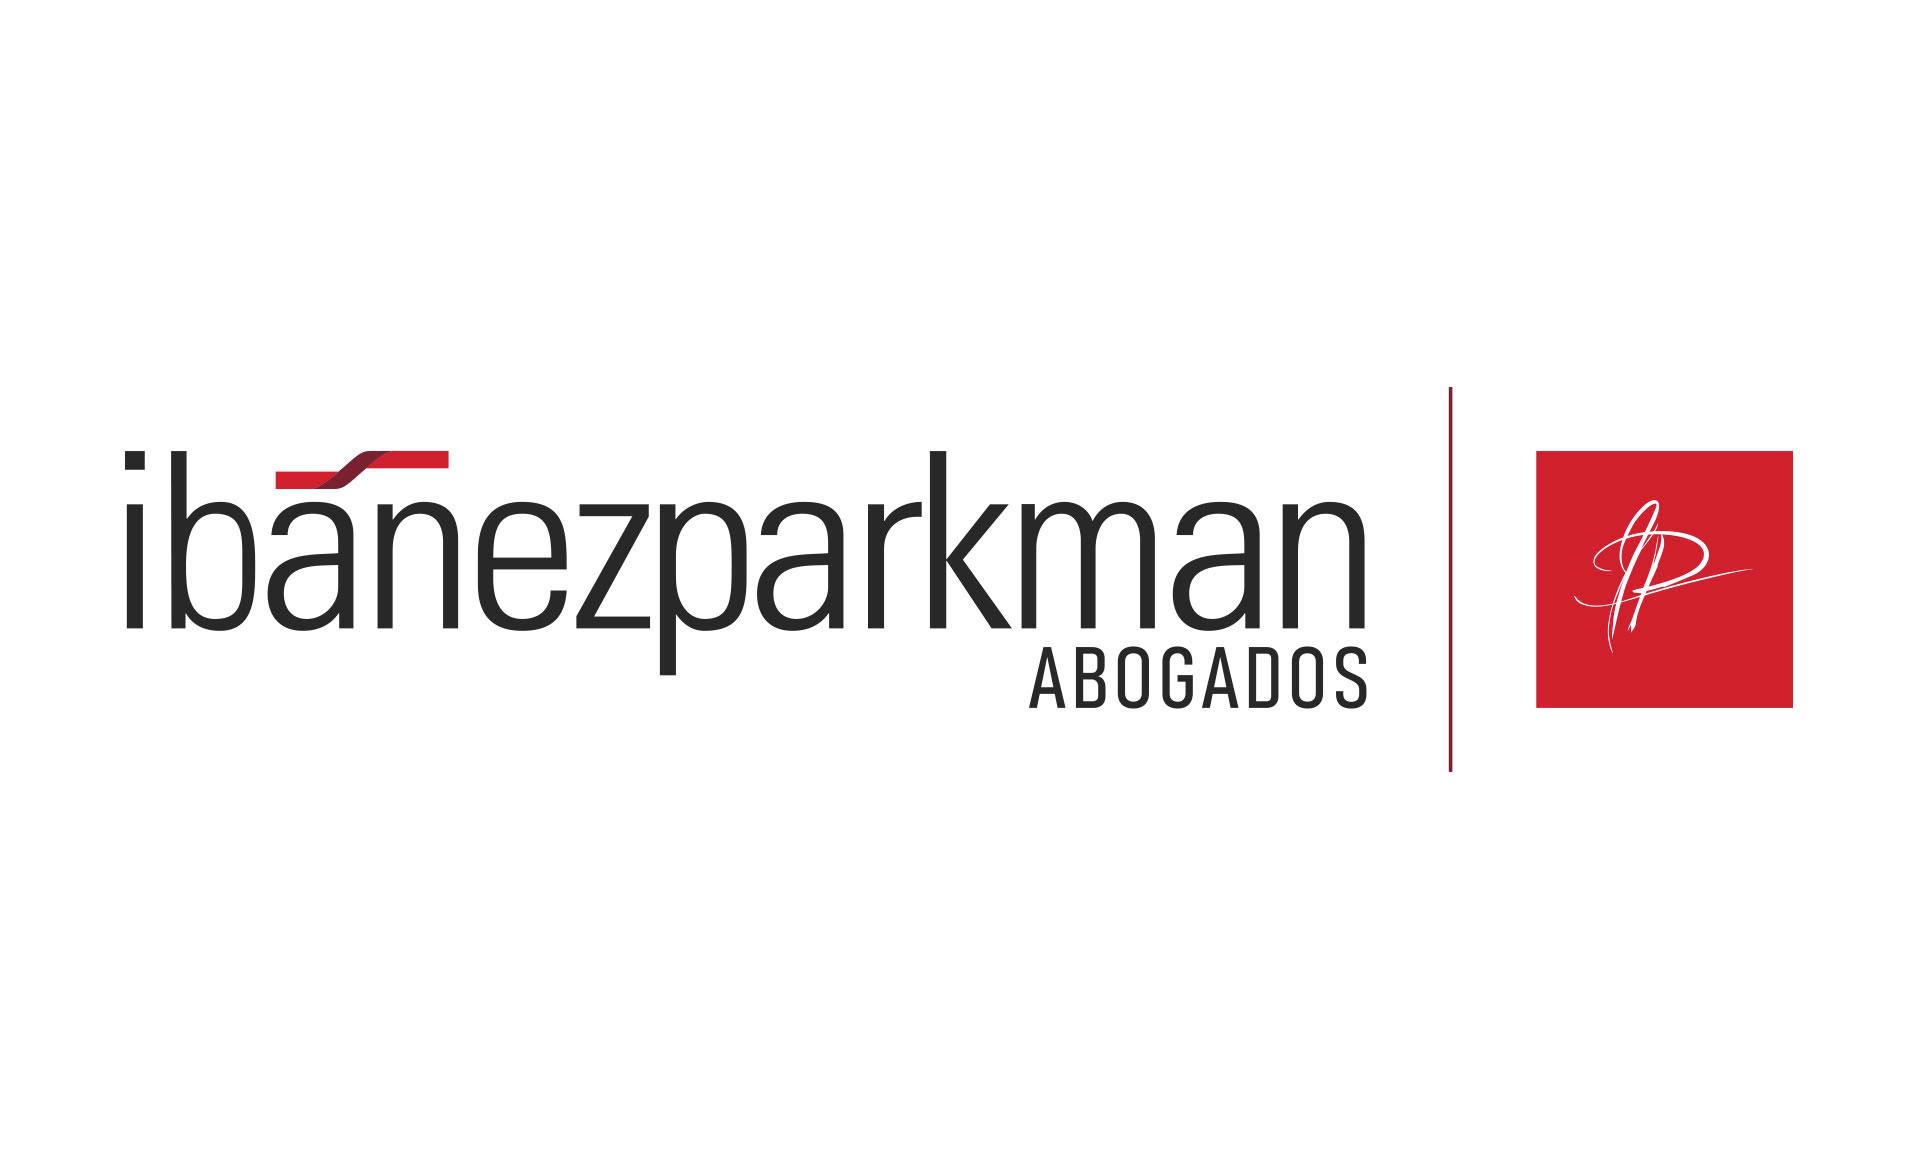 logo-red_0004_b3.-Logo-Ibáñez-Parkman